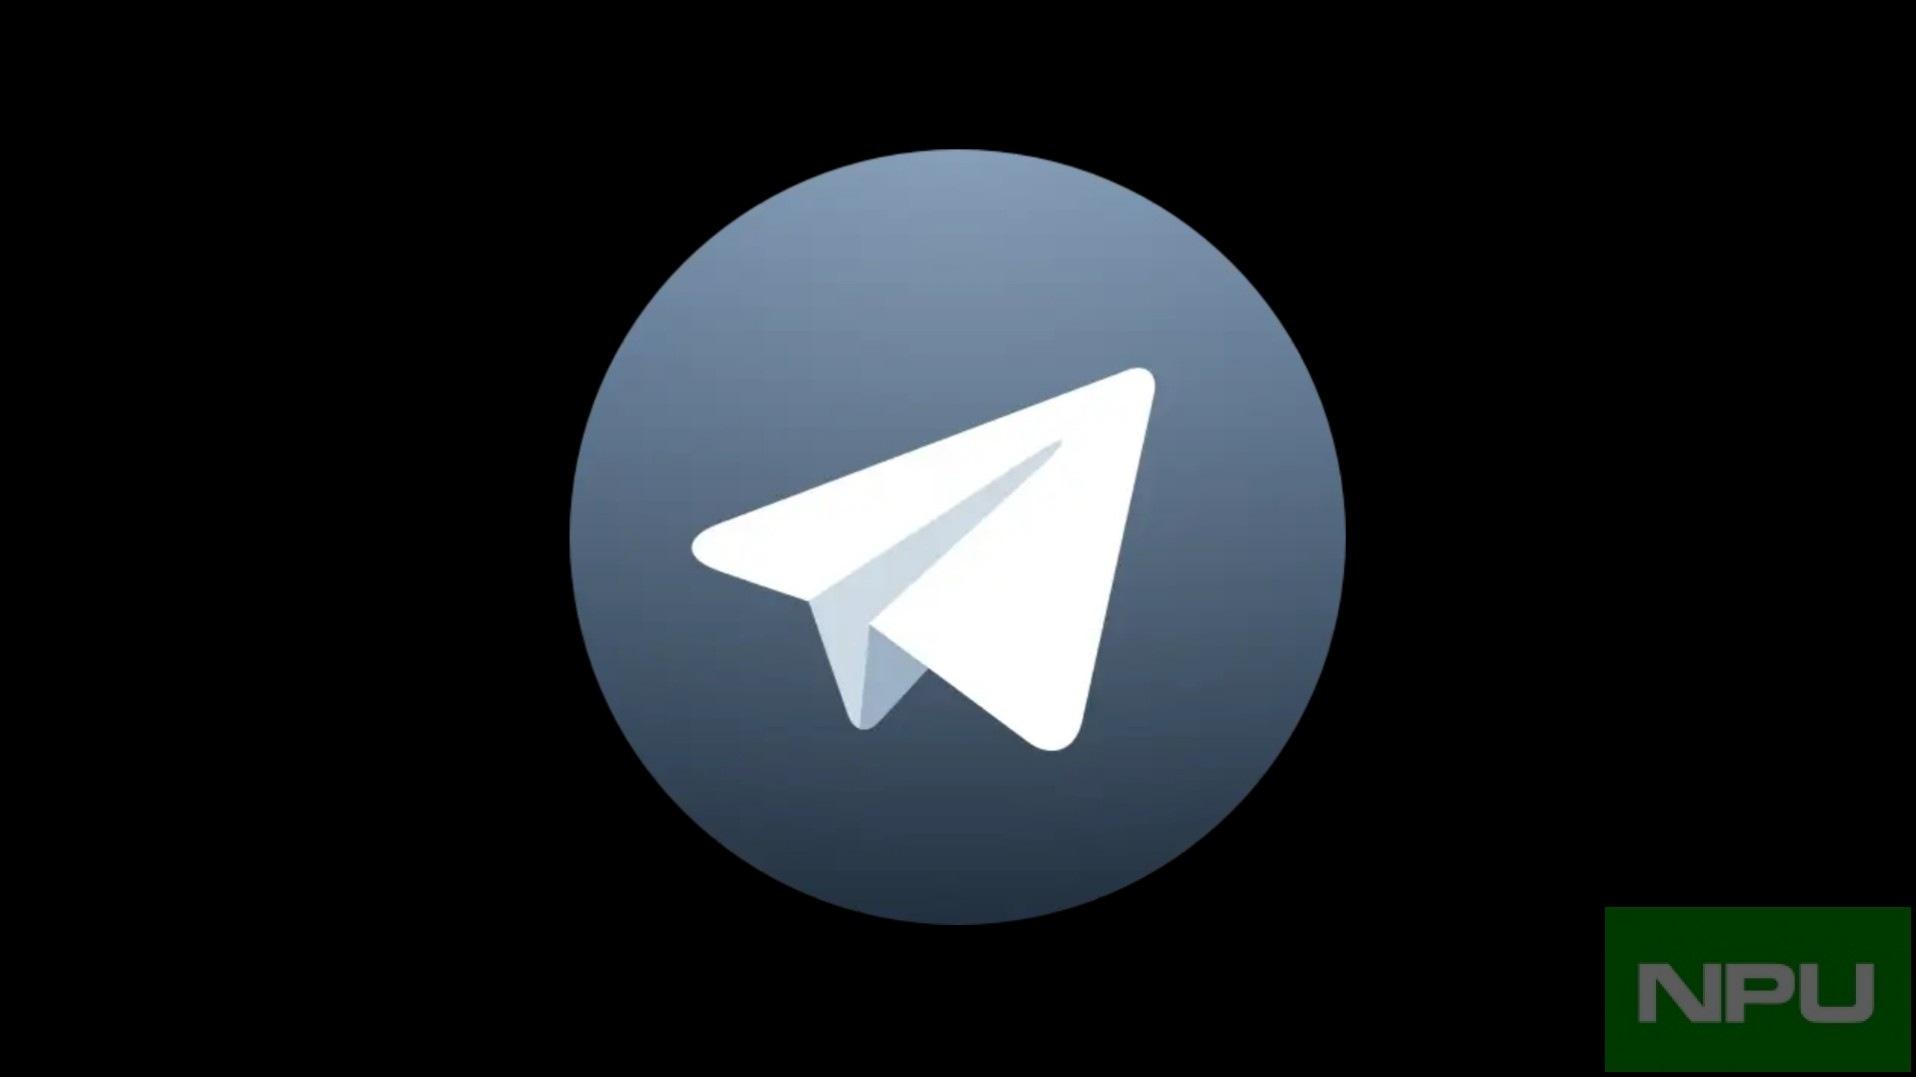 Telegram App On Android Crosses 500 Million Download In Google Play Store Nokiapoweruser